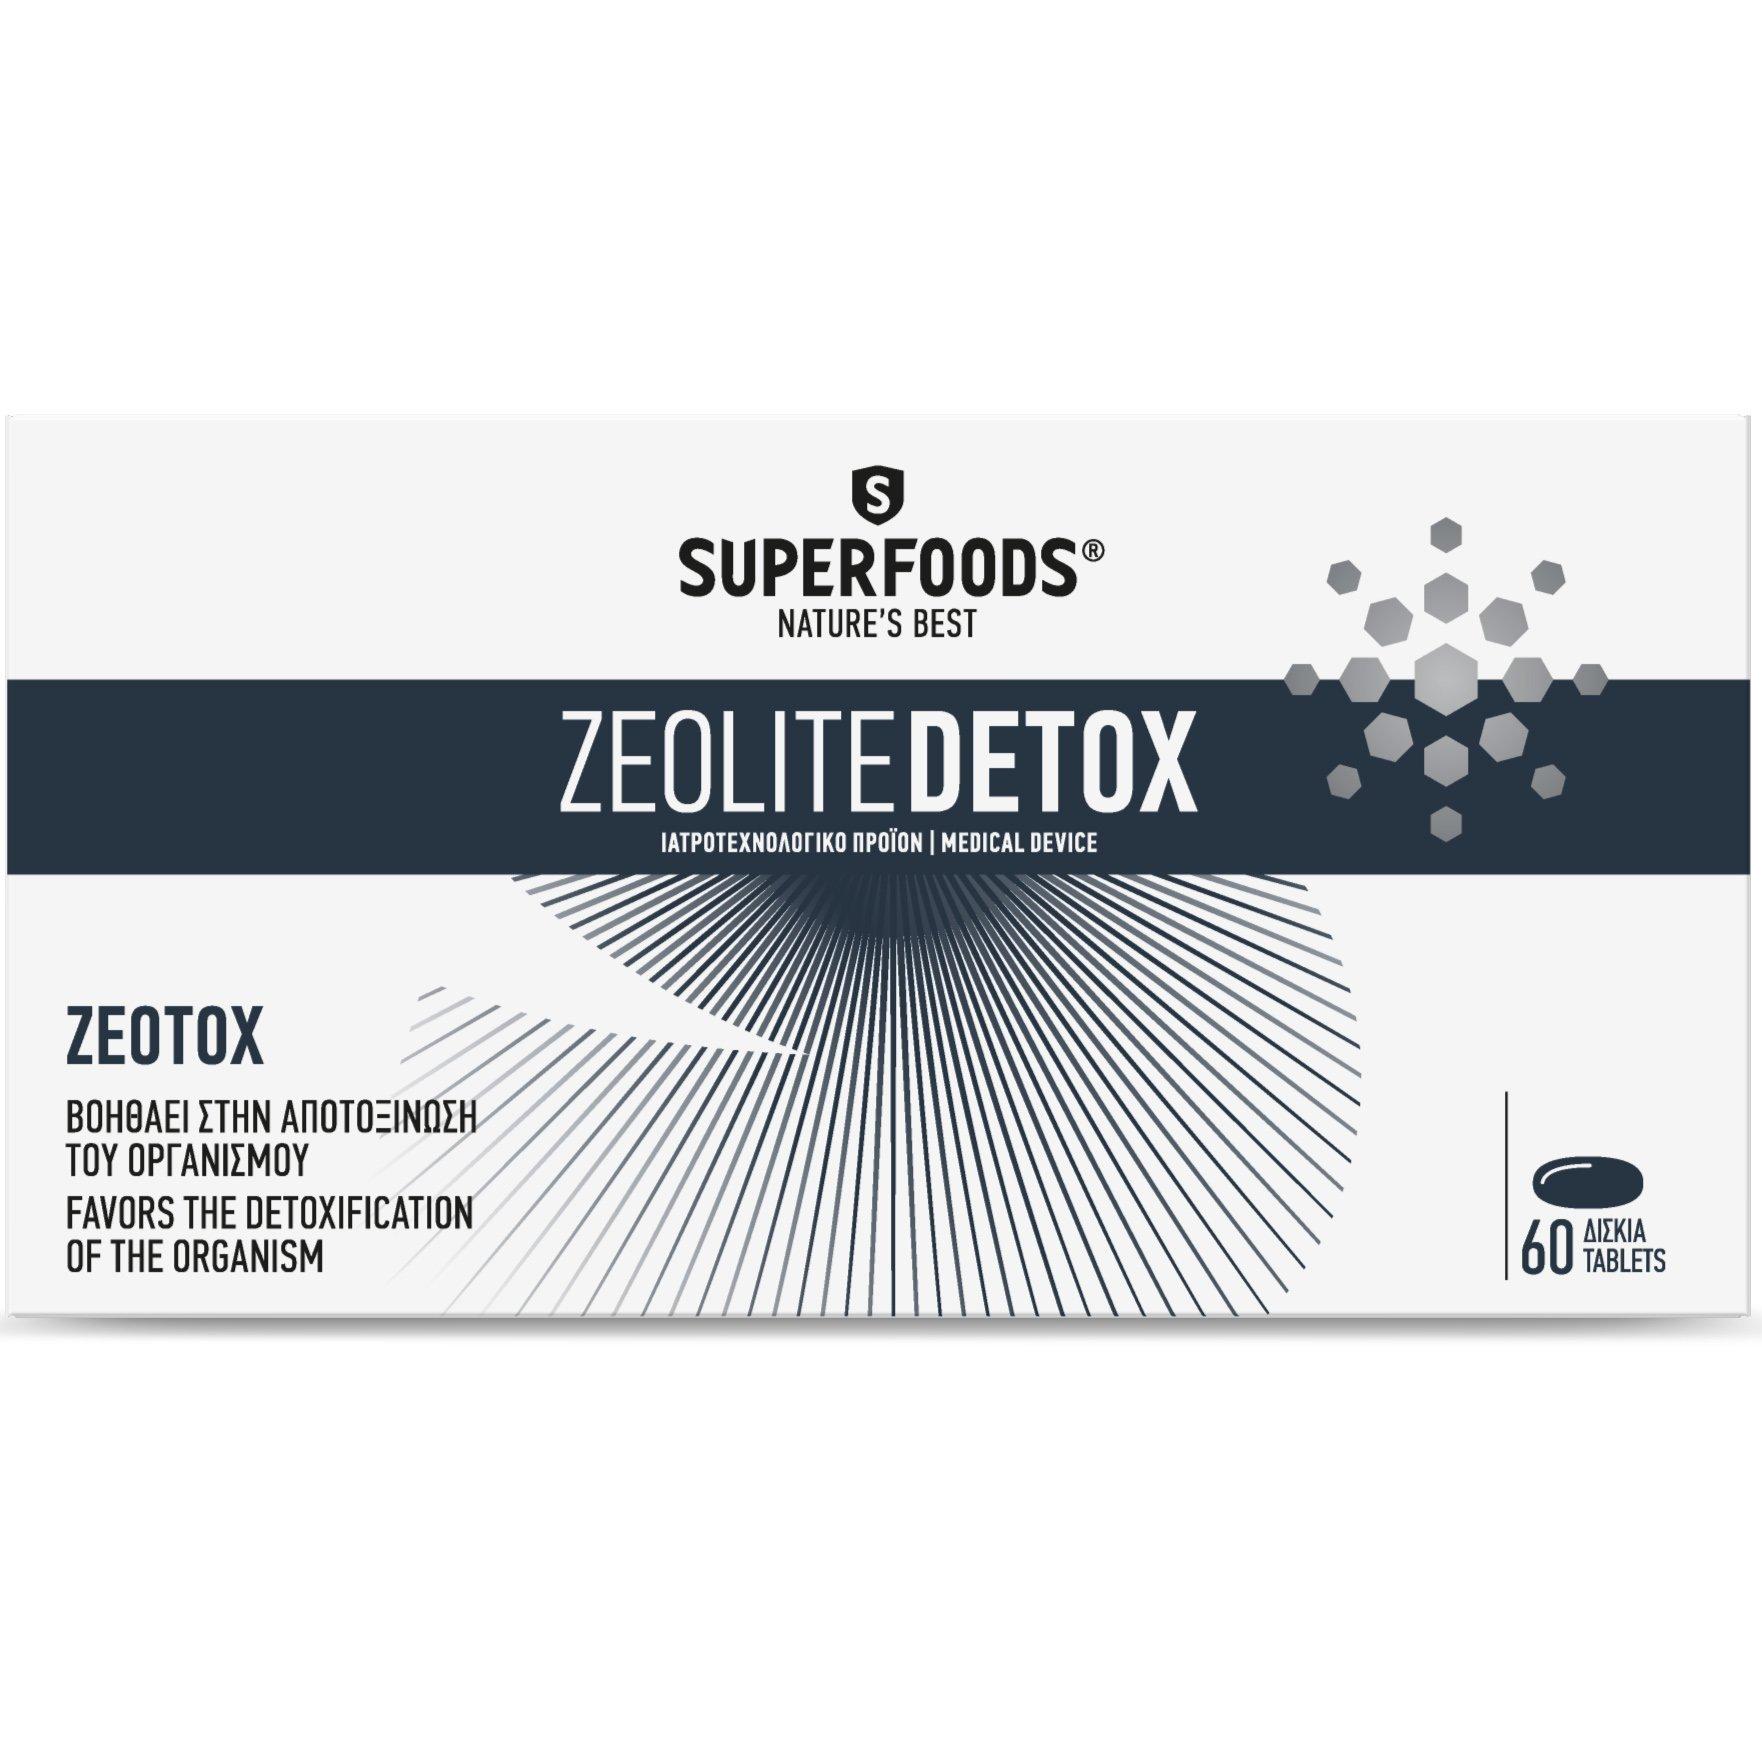 Superfoods Zeolite DetoxΣυμπλήρωμα Διατροφήςγια την Αποτοξίνωση του Οργανισμού60tabs